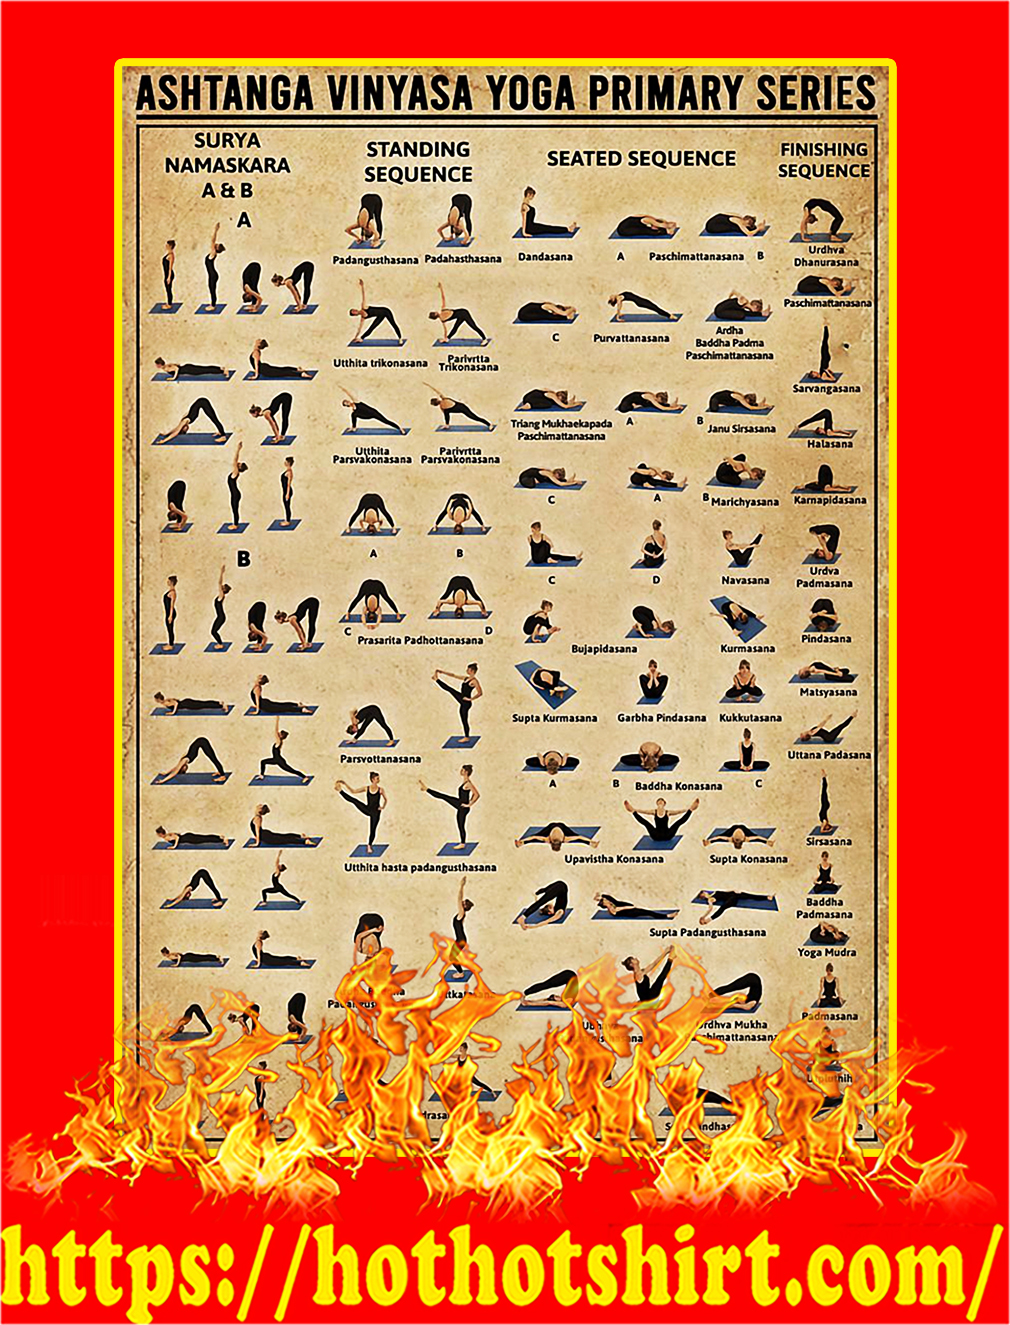 Ashtanga Vinyasa Yoga Primary Series Poster